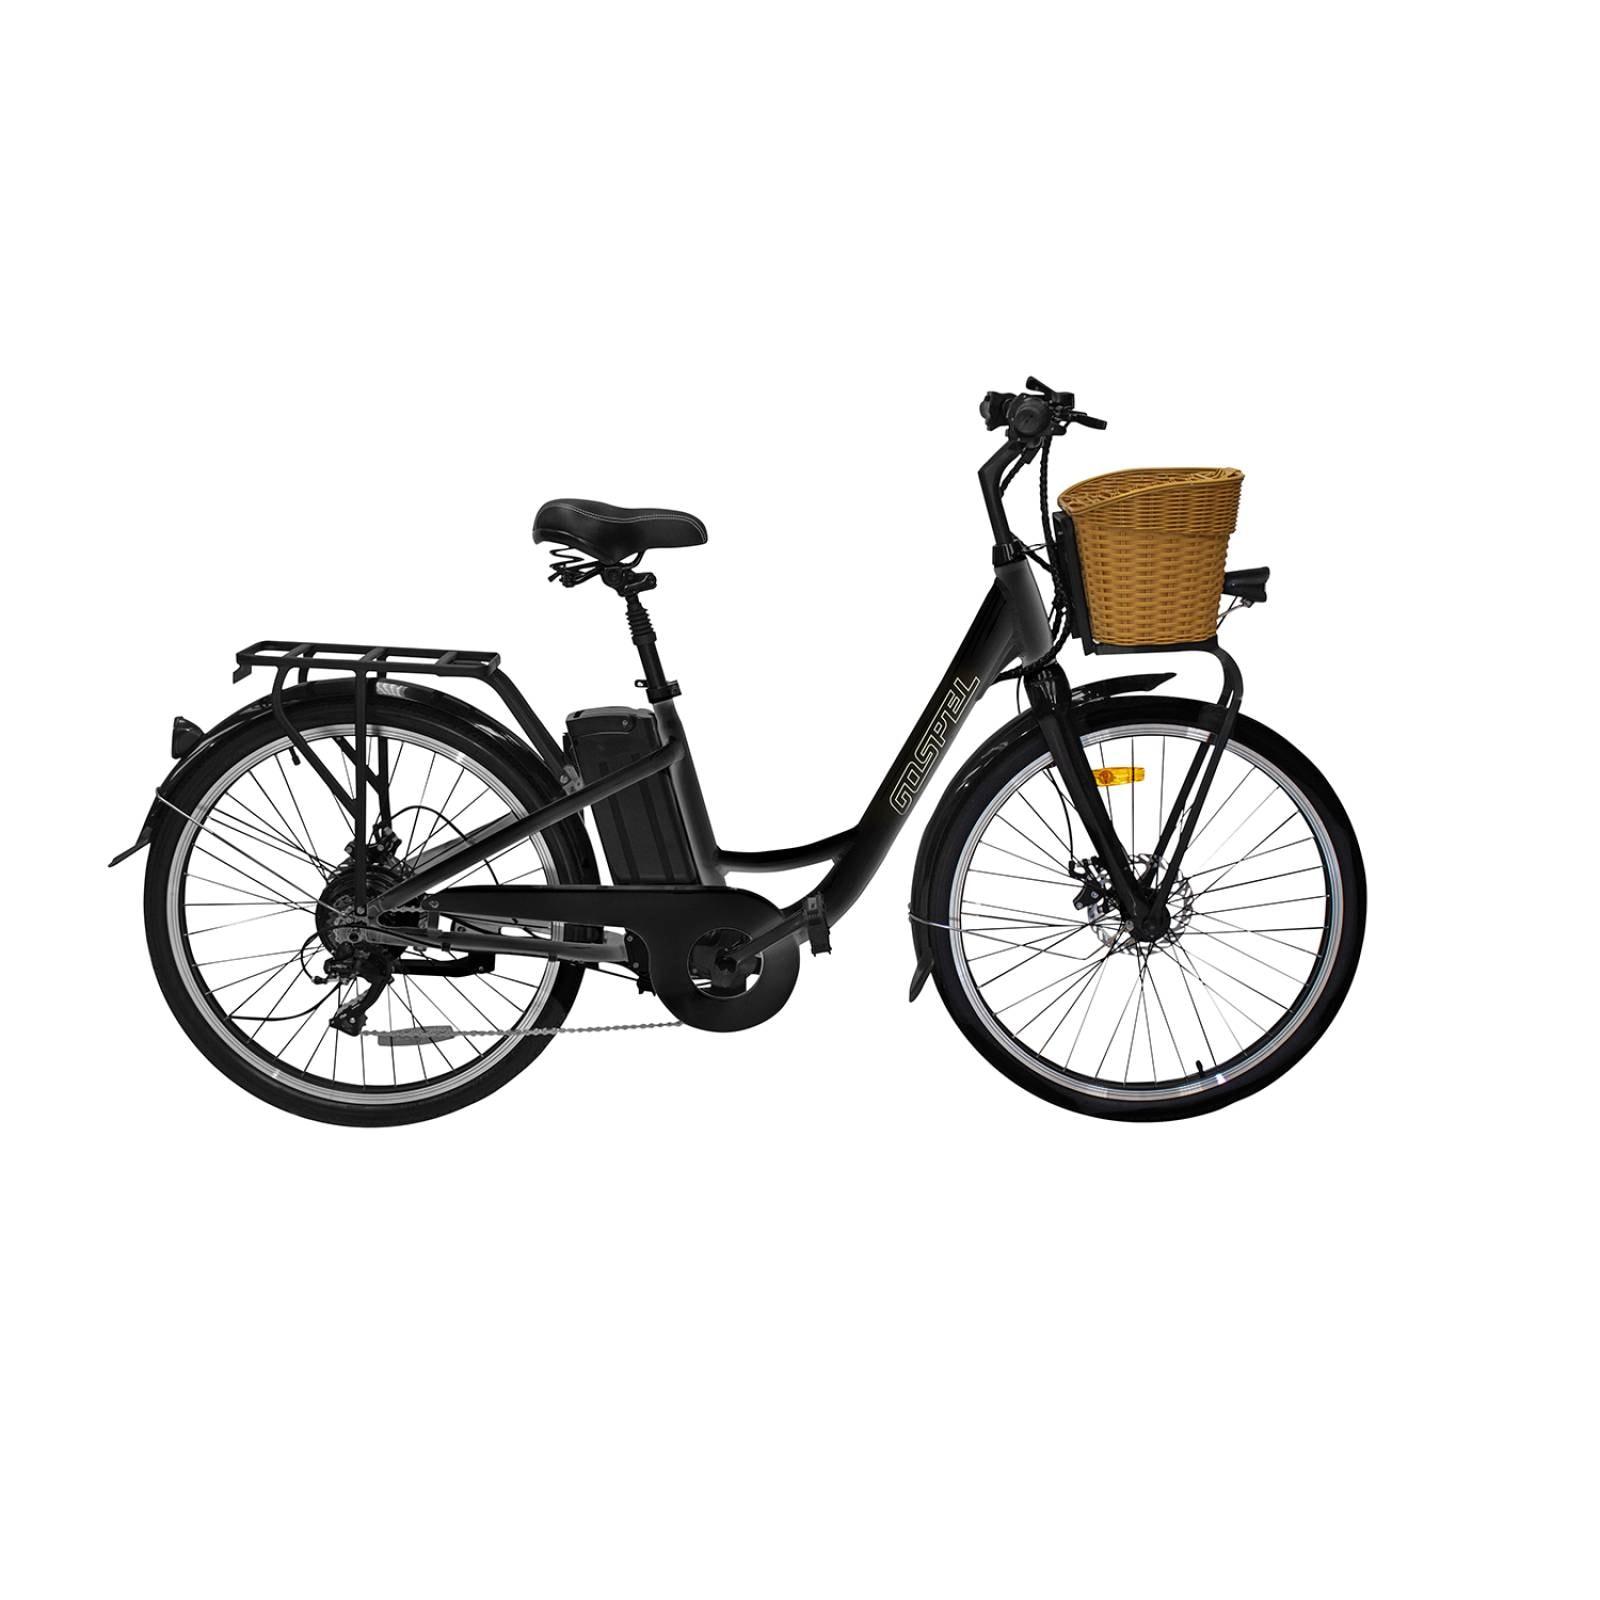 Bicicleta electrica Breeze Negra